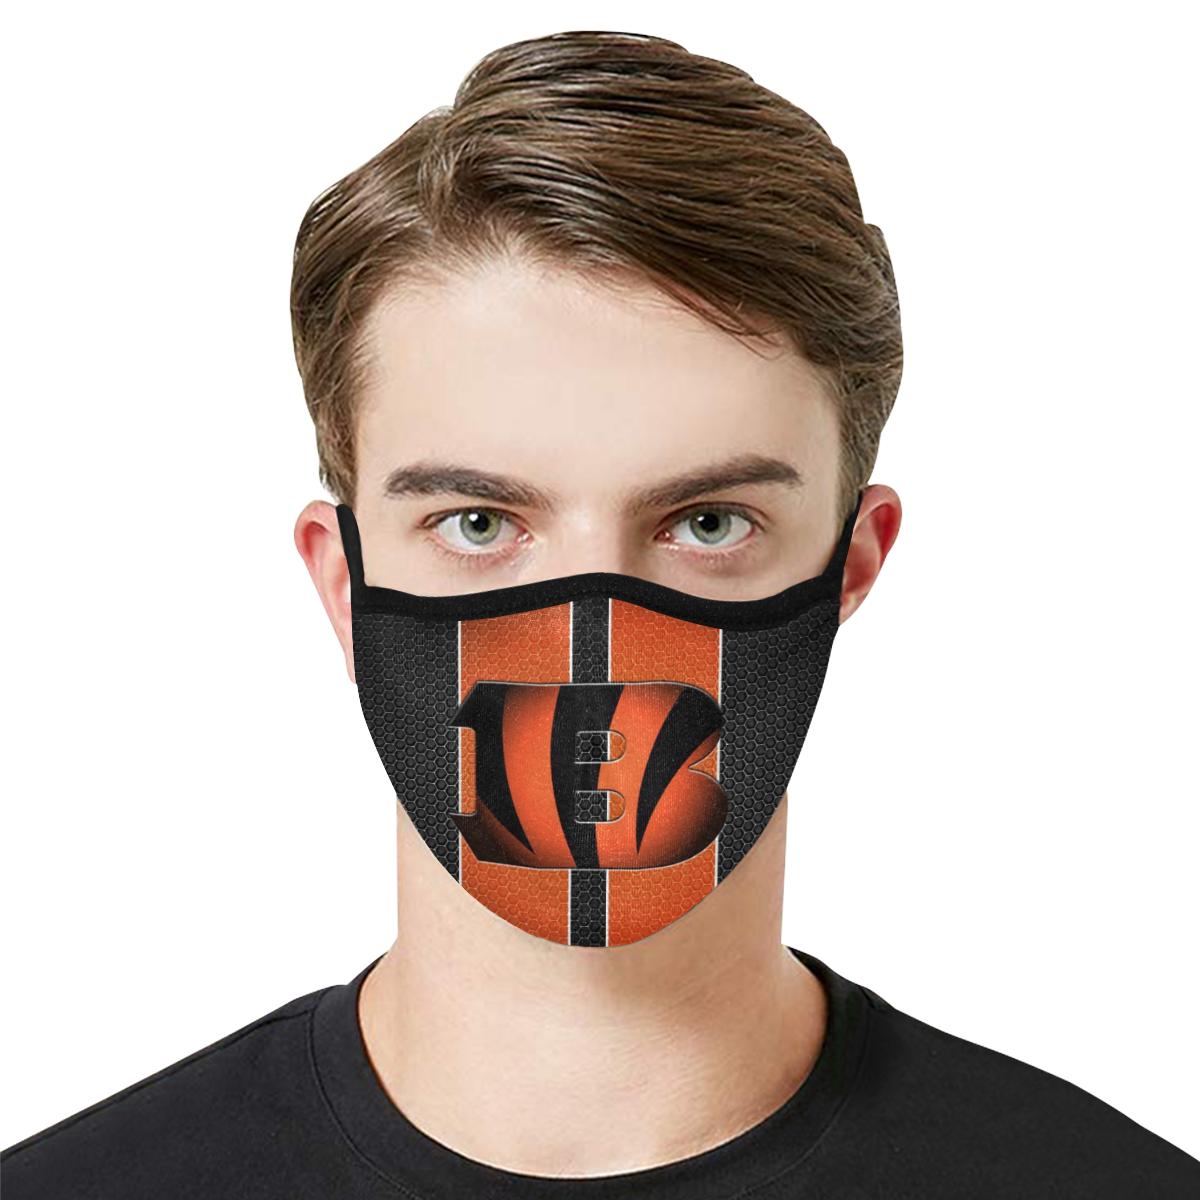 Cincinnati Bengals Face Mask PM2.5